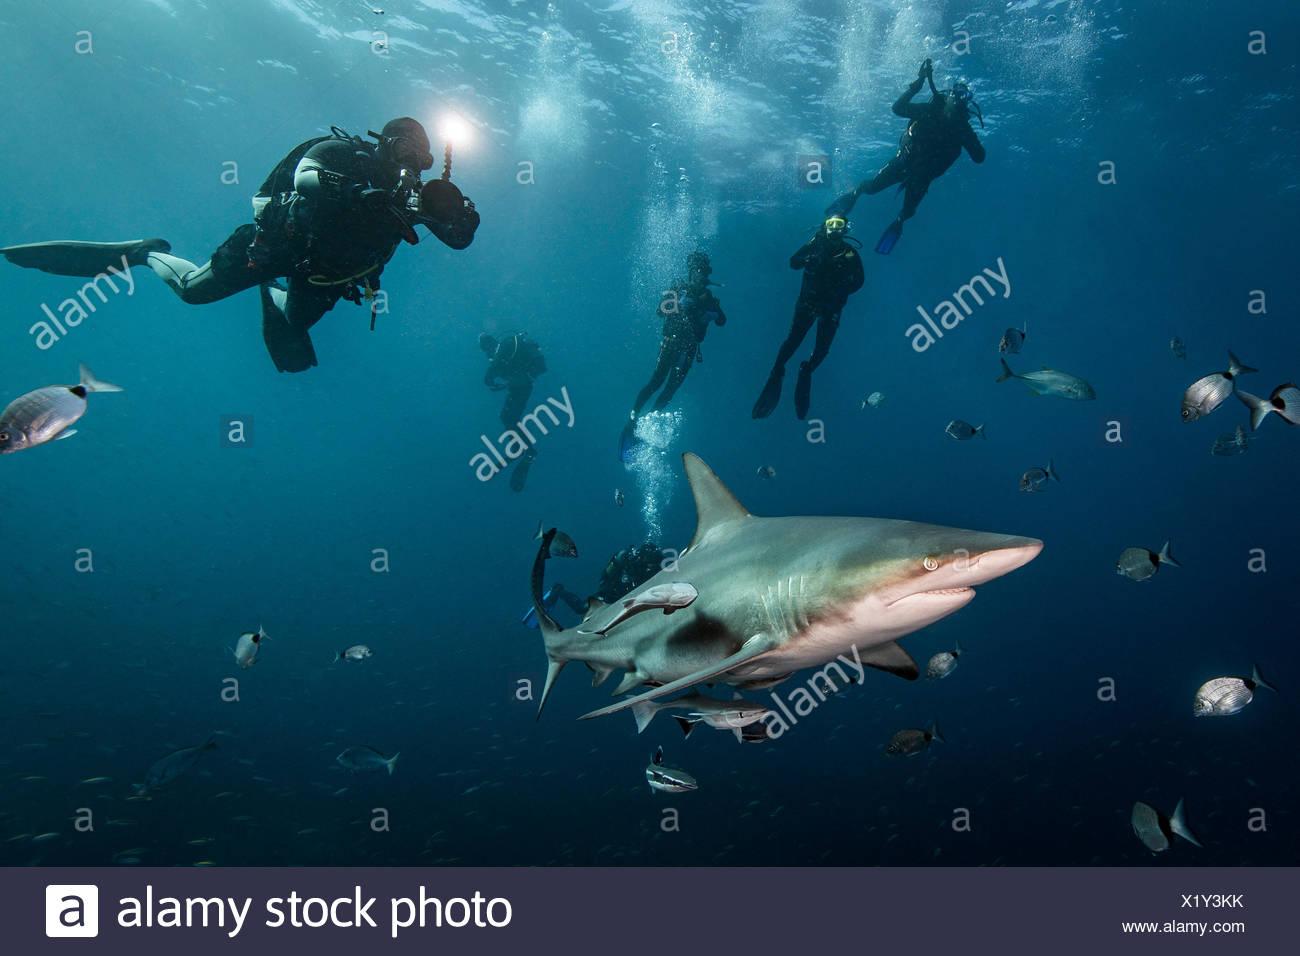 Scuba divers' encounter with large Oceanic Blacktip Shark (Carcharhinus Limbatus), Aliwal Shoal, South Africa Stock Photo